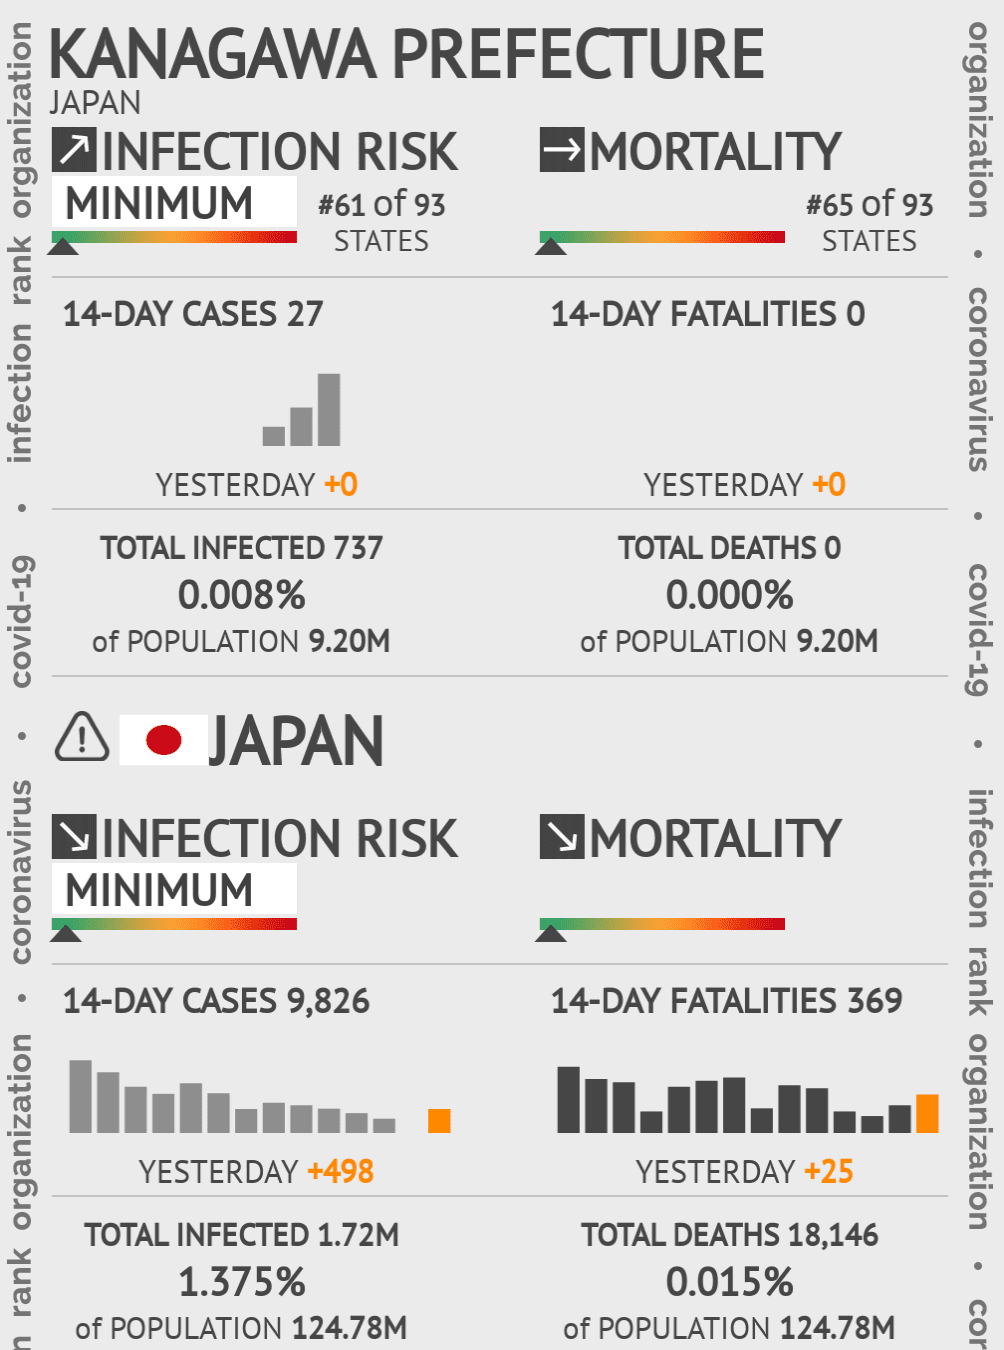 Kanagawa Prefecture Coronavirus Covid-19 Risk of Infection on May 14, 2020